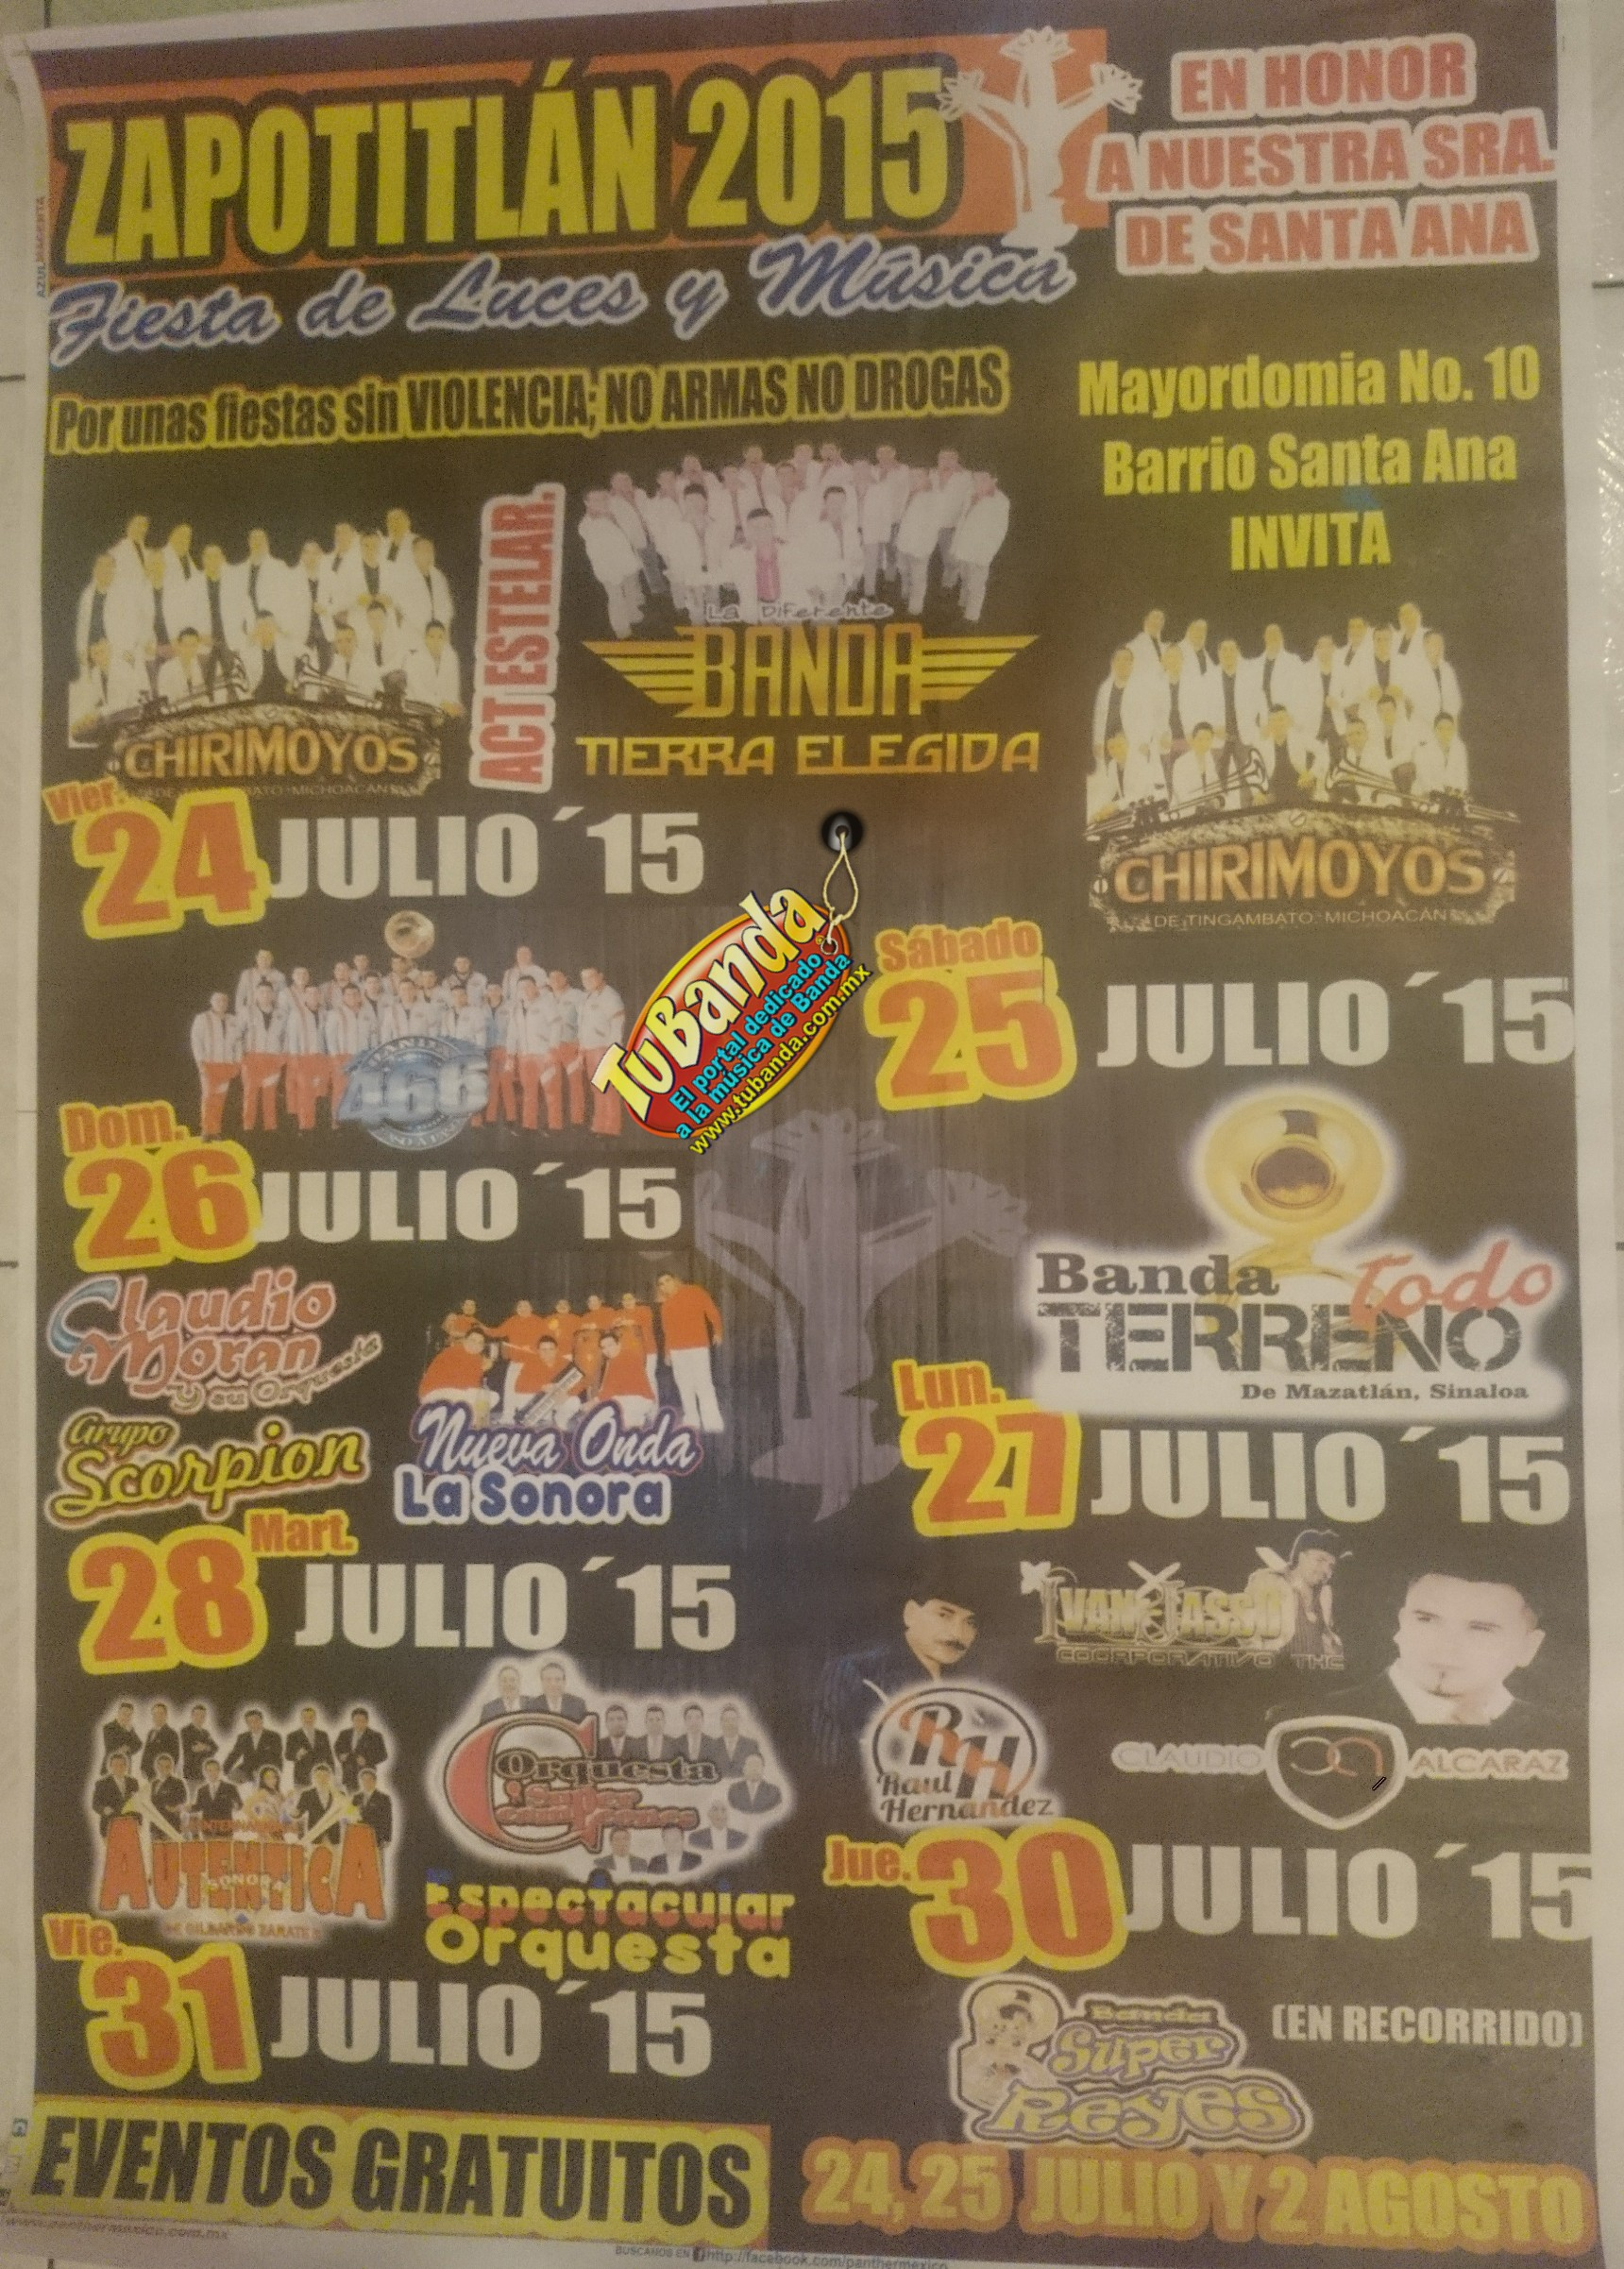 Zapotitlan julio fiesta 2015